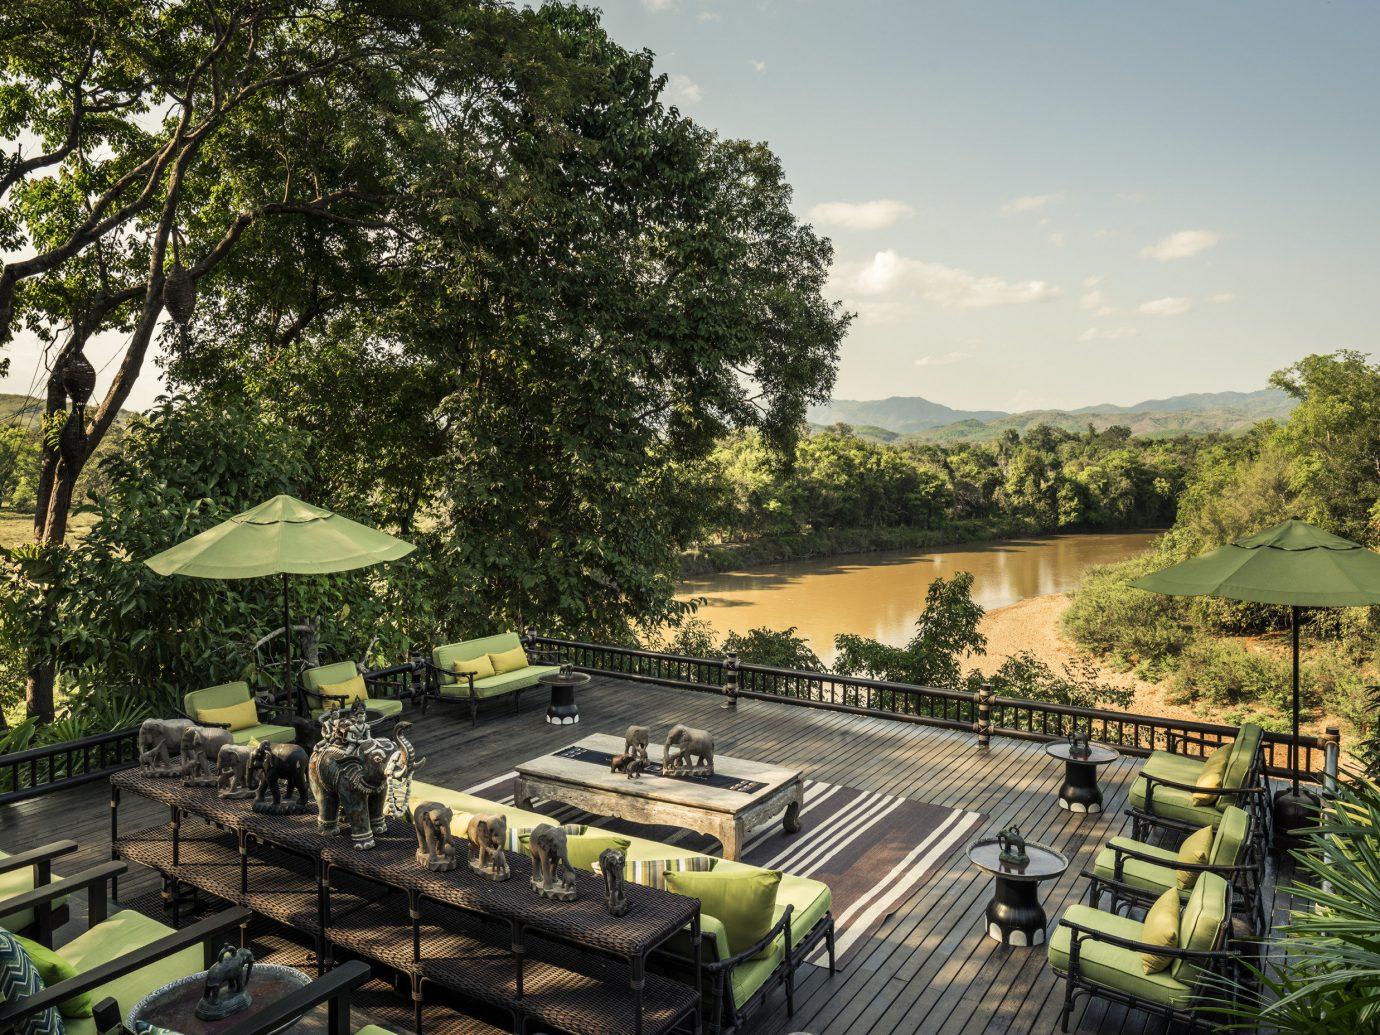 Luxury Travel Trip Ideas tree outdoor estate residential area park mansion Resort screenshot Jungle lined Garden furniture several